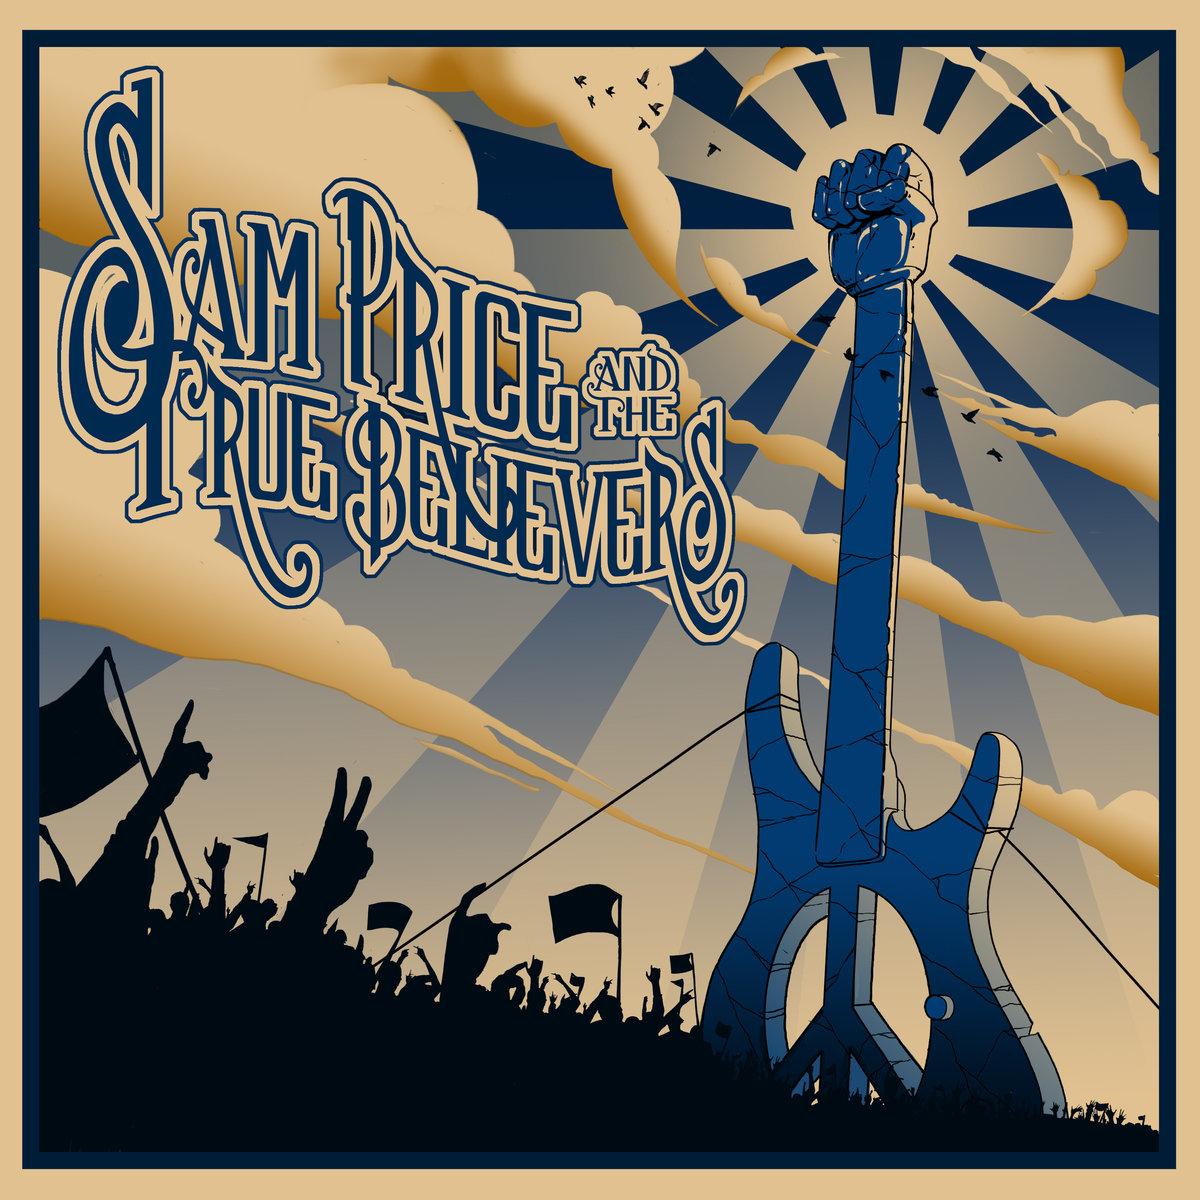 Sam Price & the True Believers - Sam Price & the True Believers (EP CD)